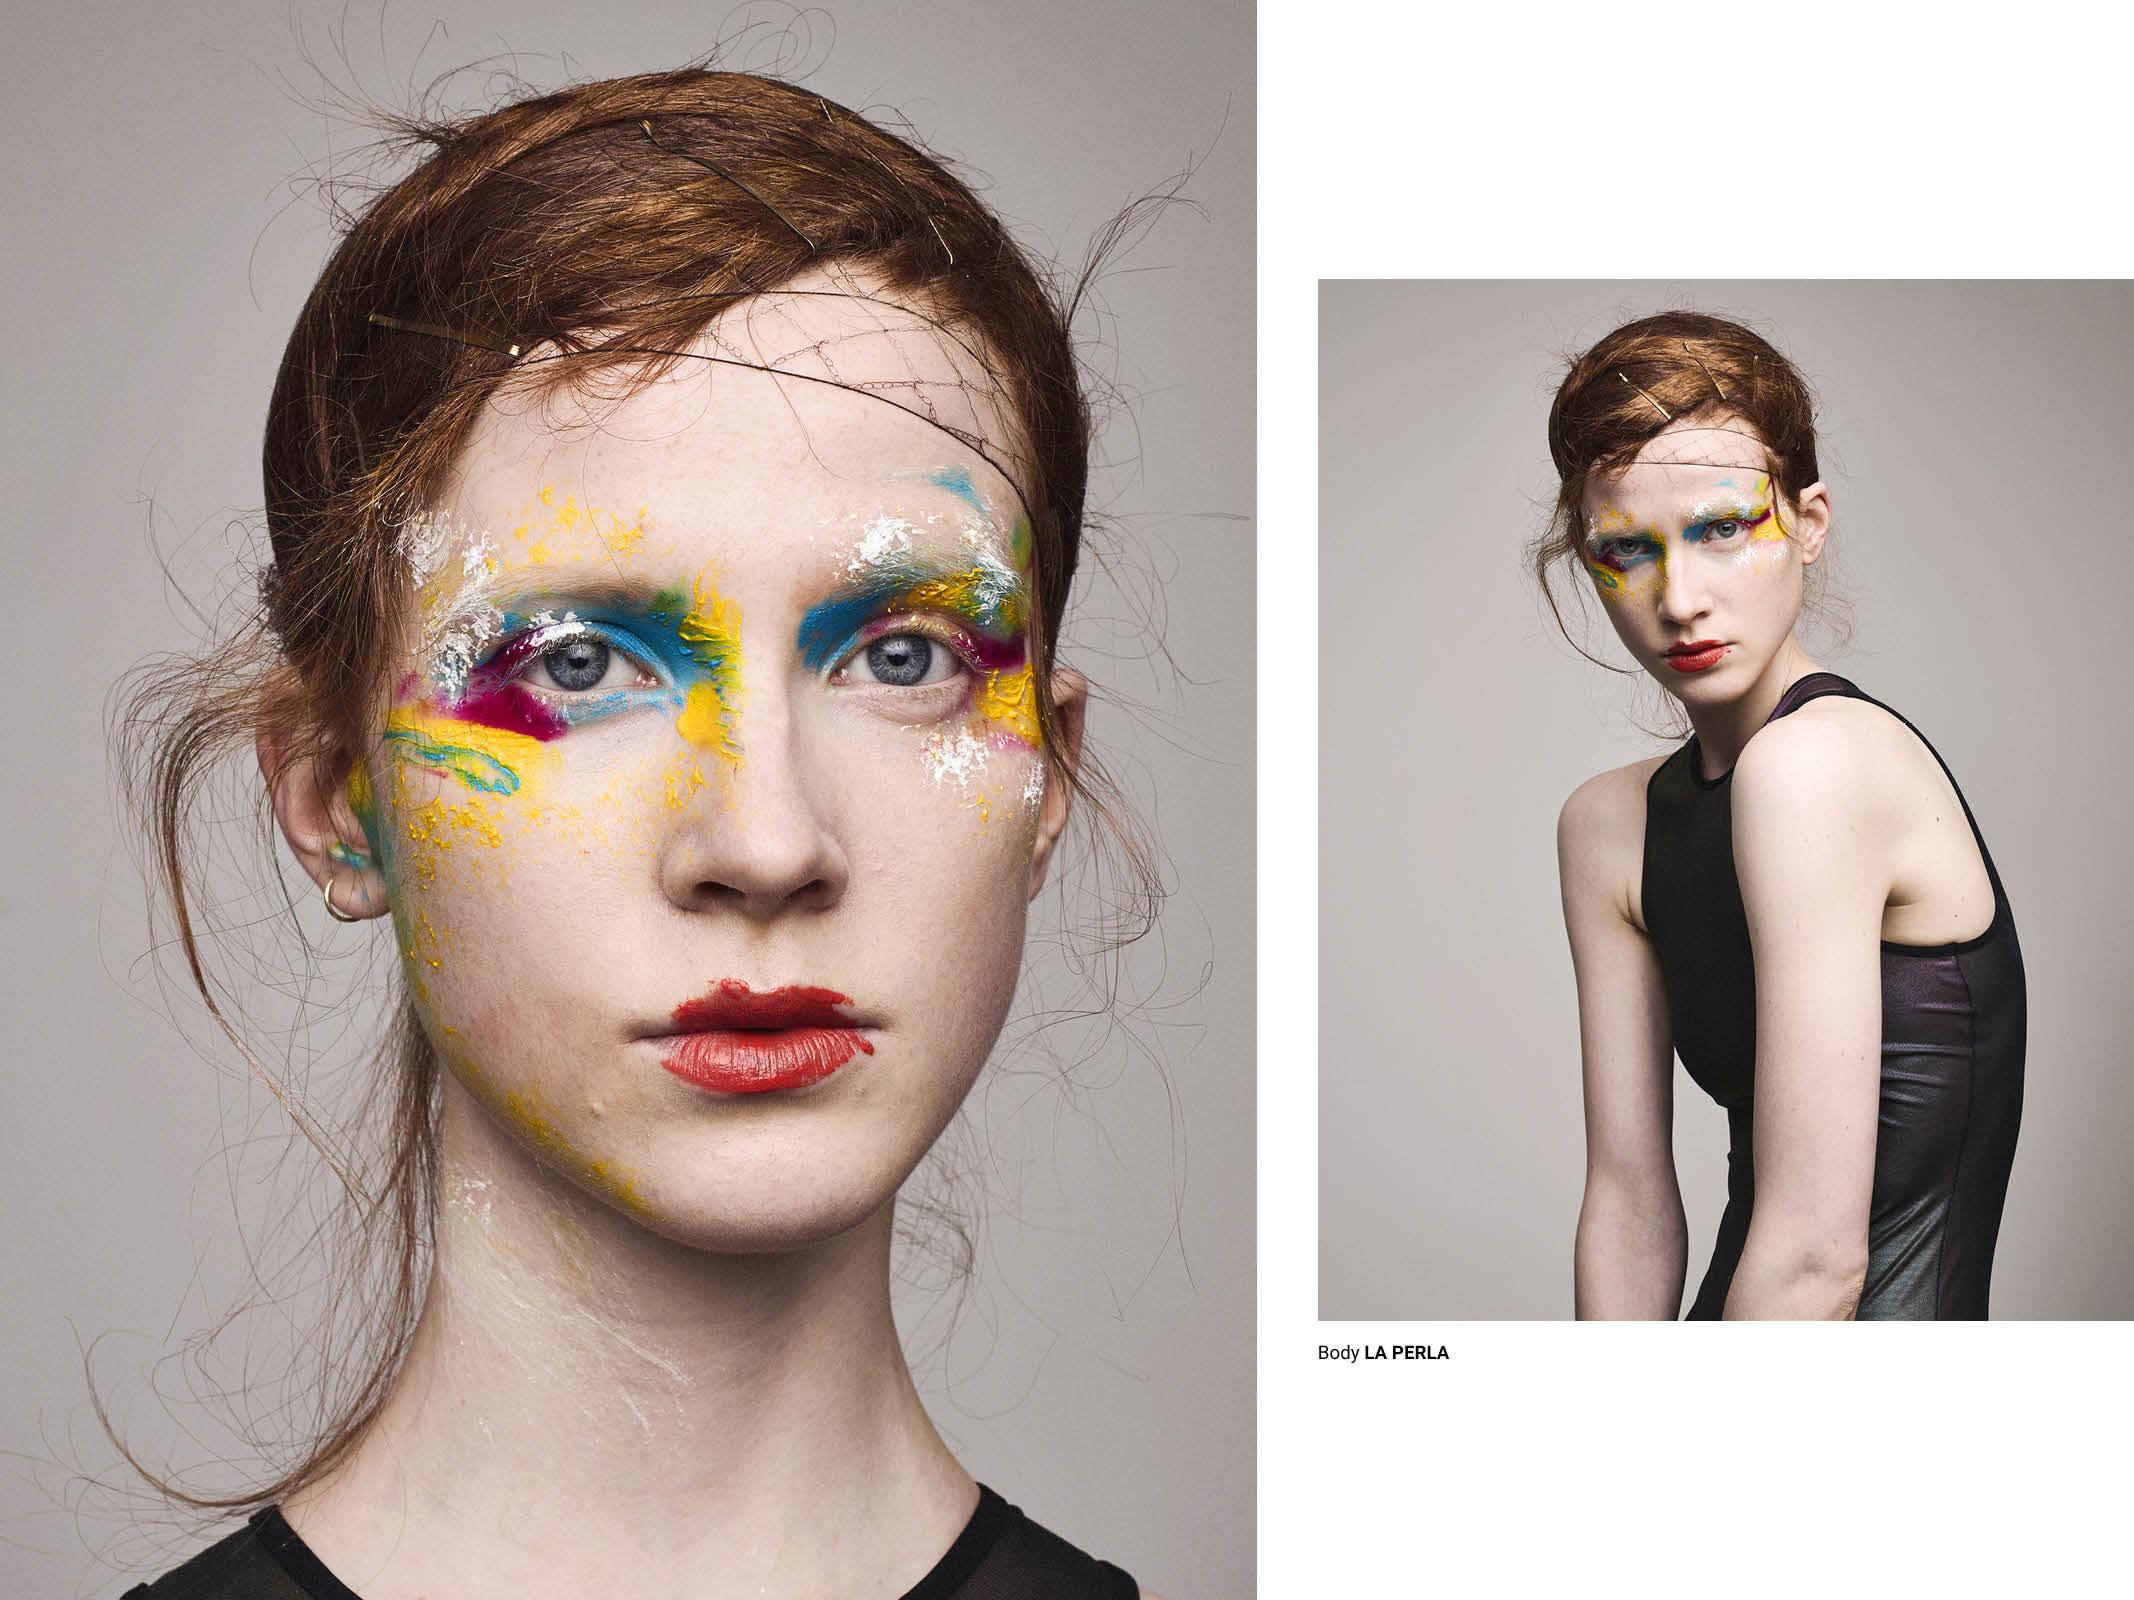 jose-herrera-mujer-hoy-moda-amplituddemiras-04-min